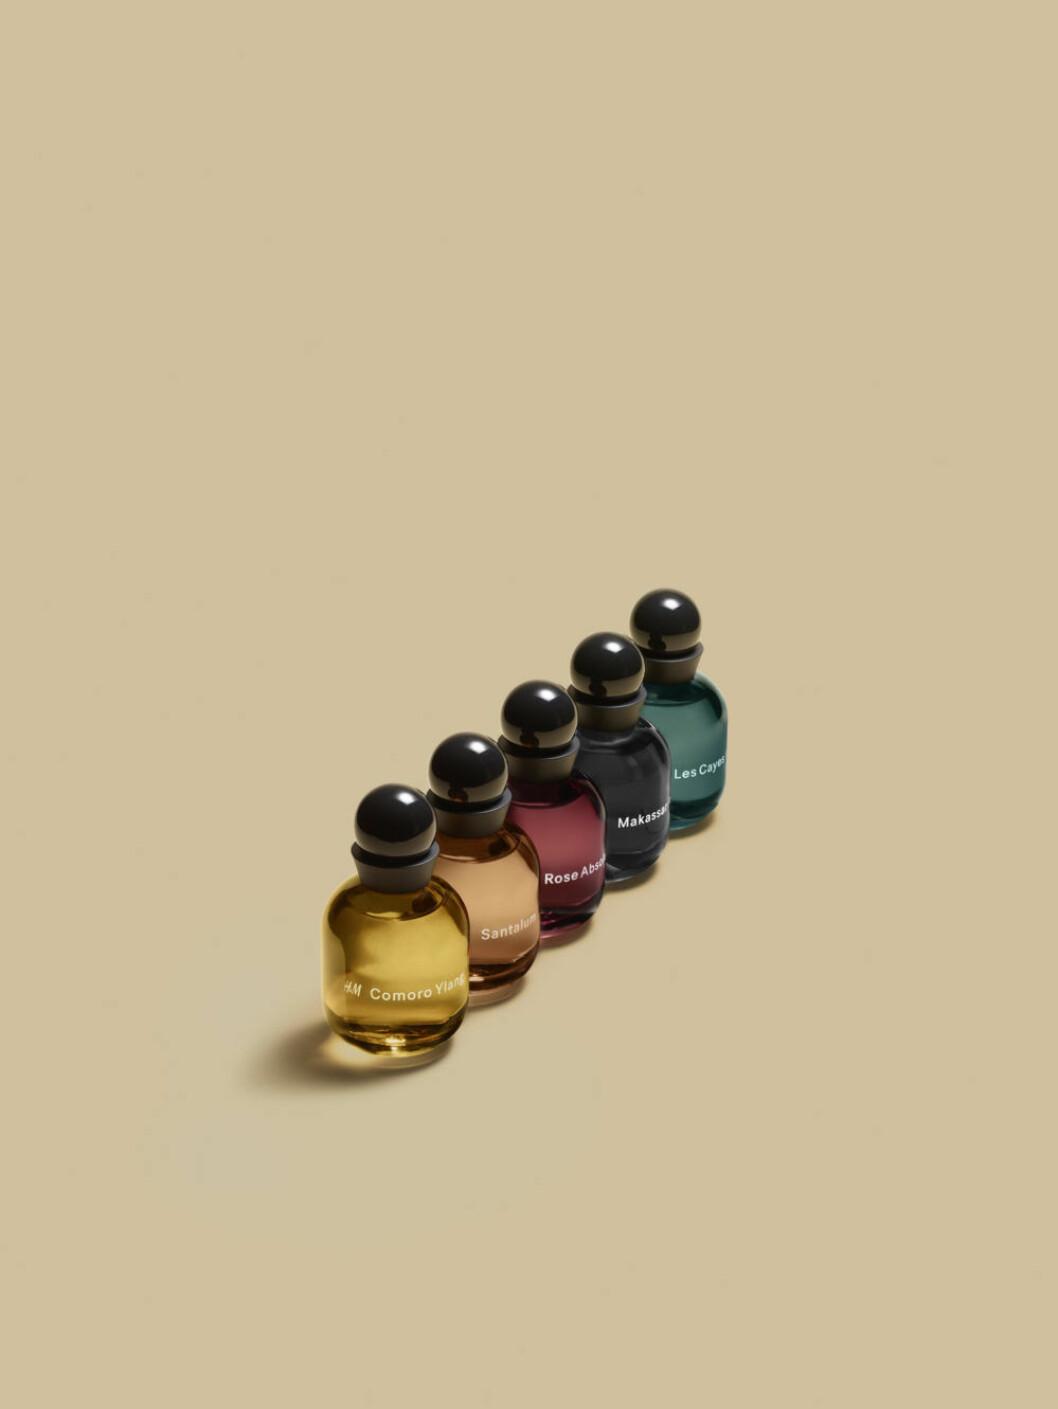 Den tredje parfymkategorin är The essences